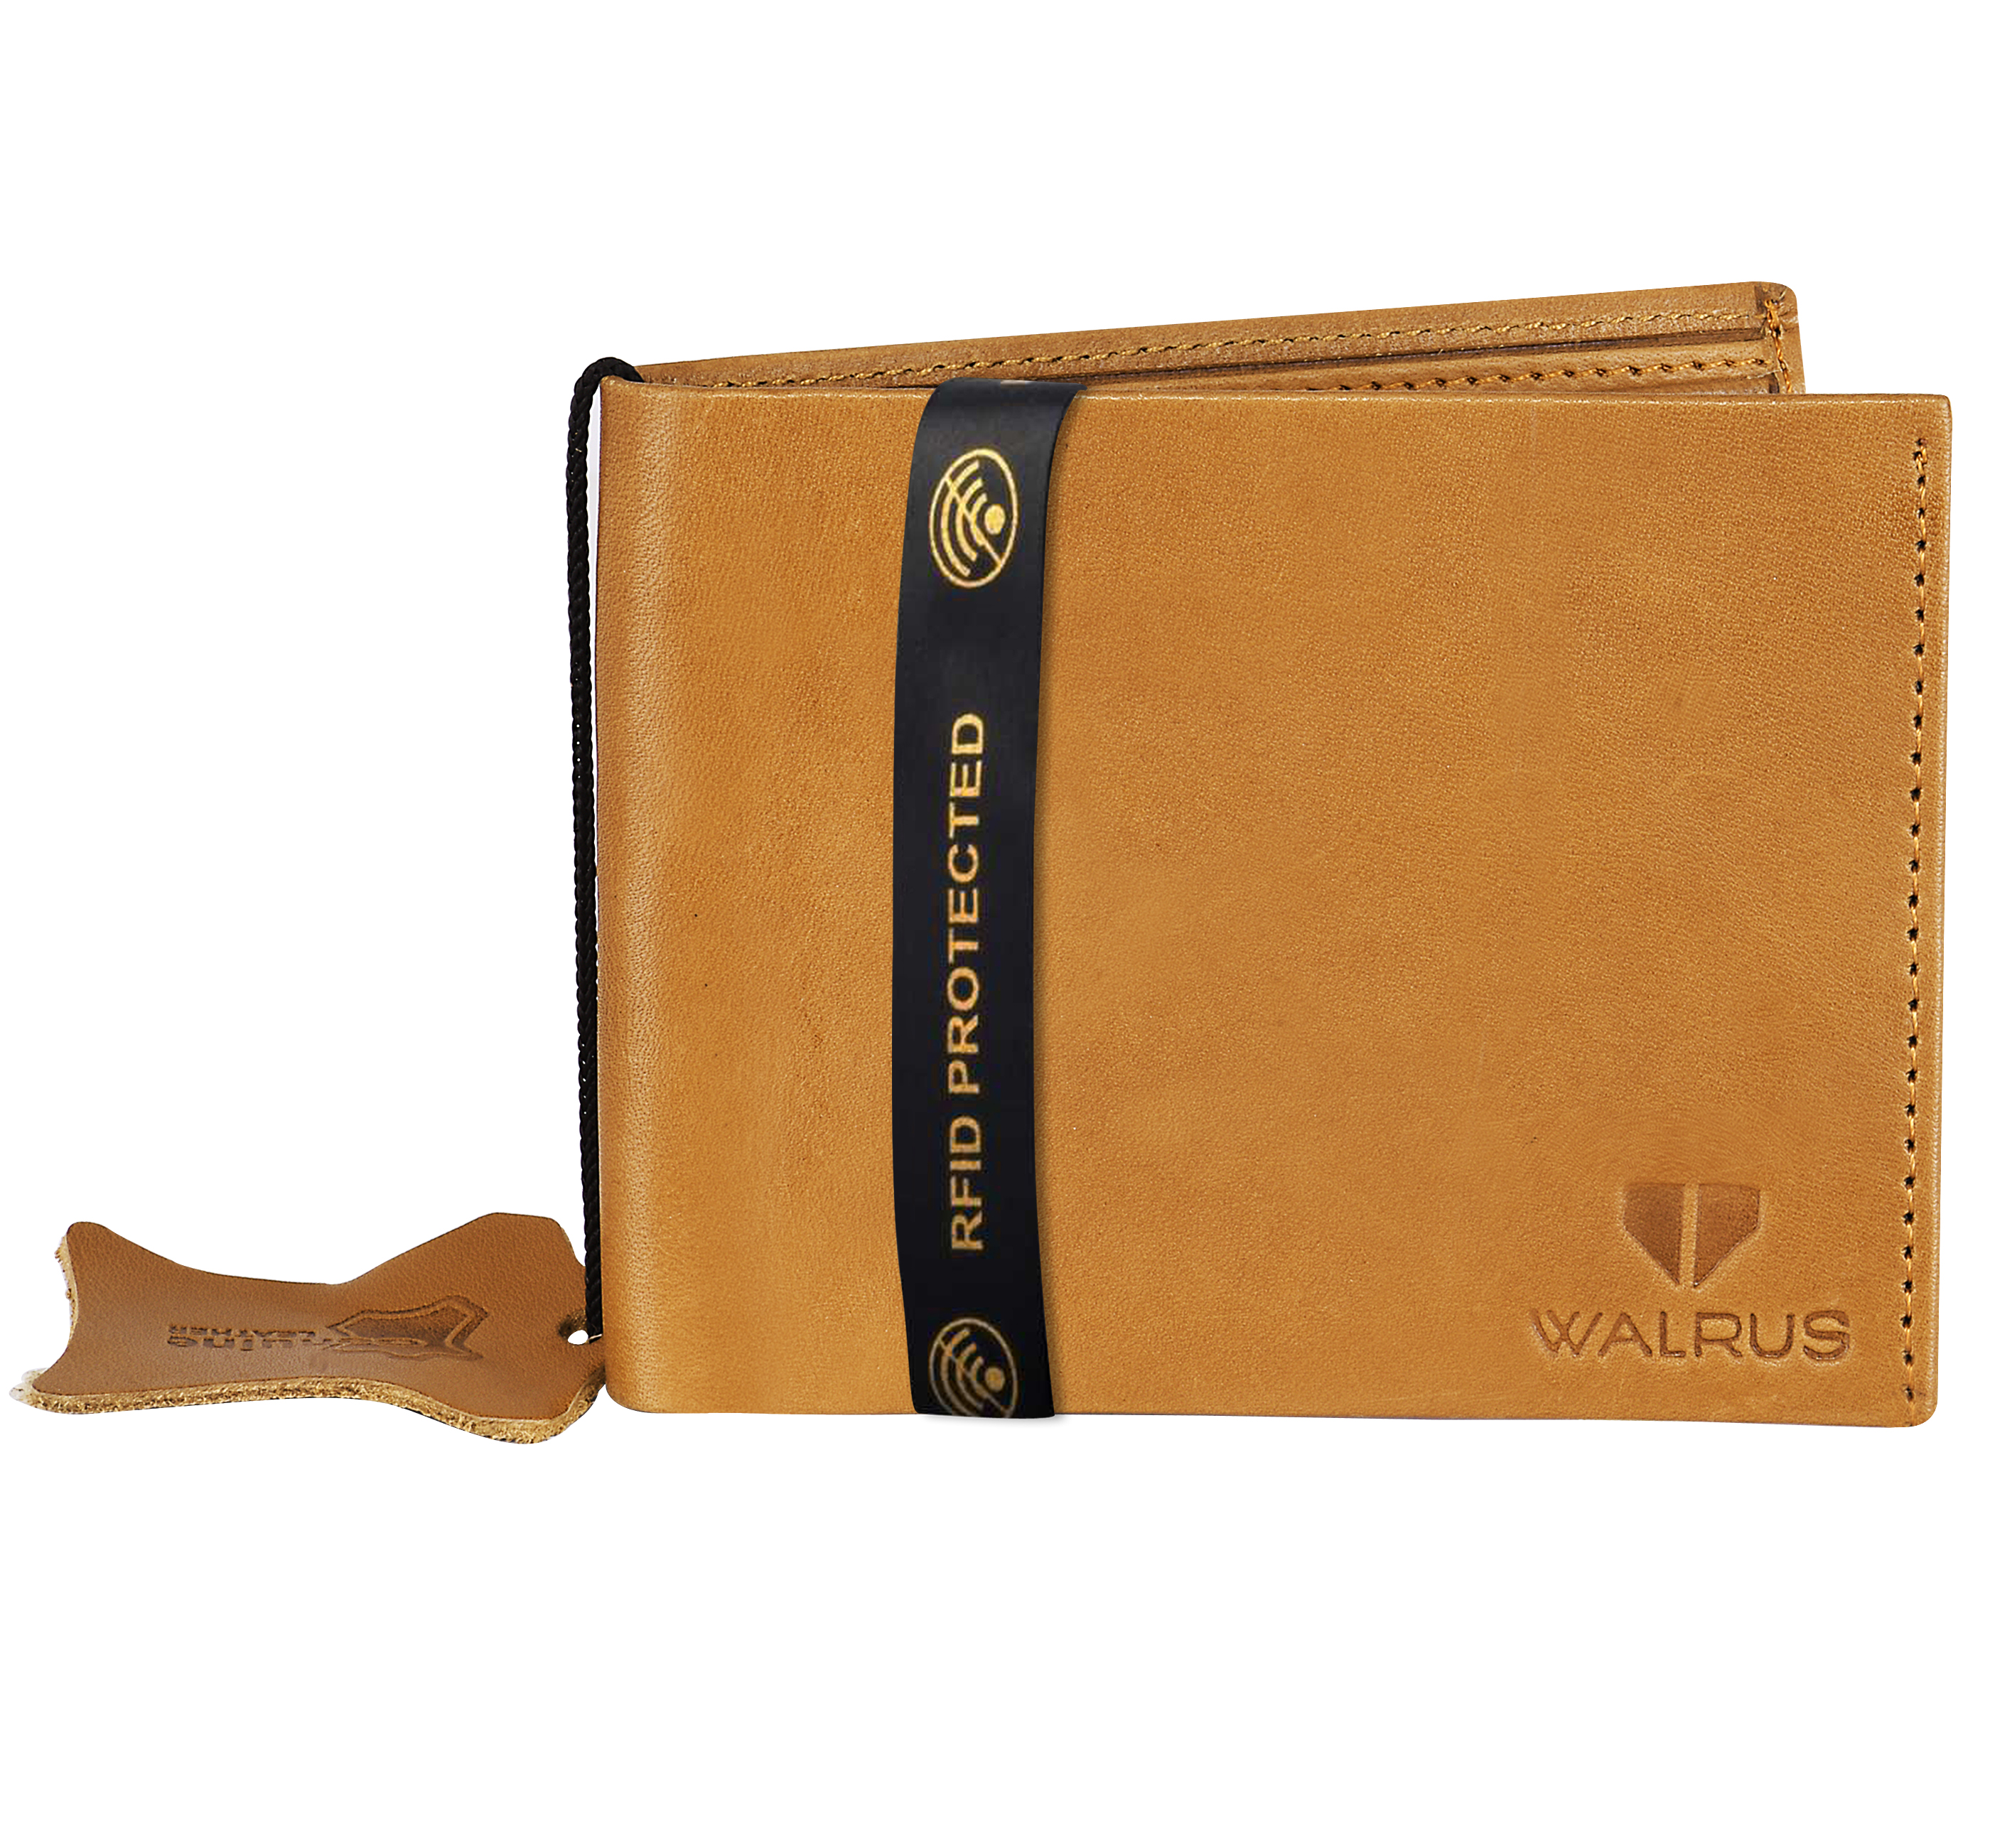 Walrus | Walrus Imperial III Beige Vegan Leather Men Wallet With RFID Protection.